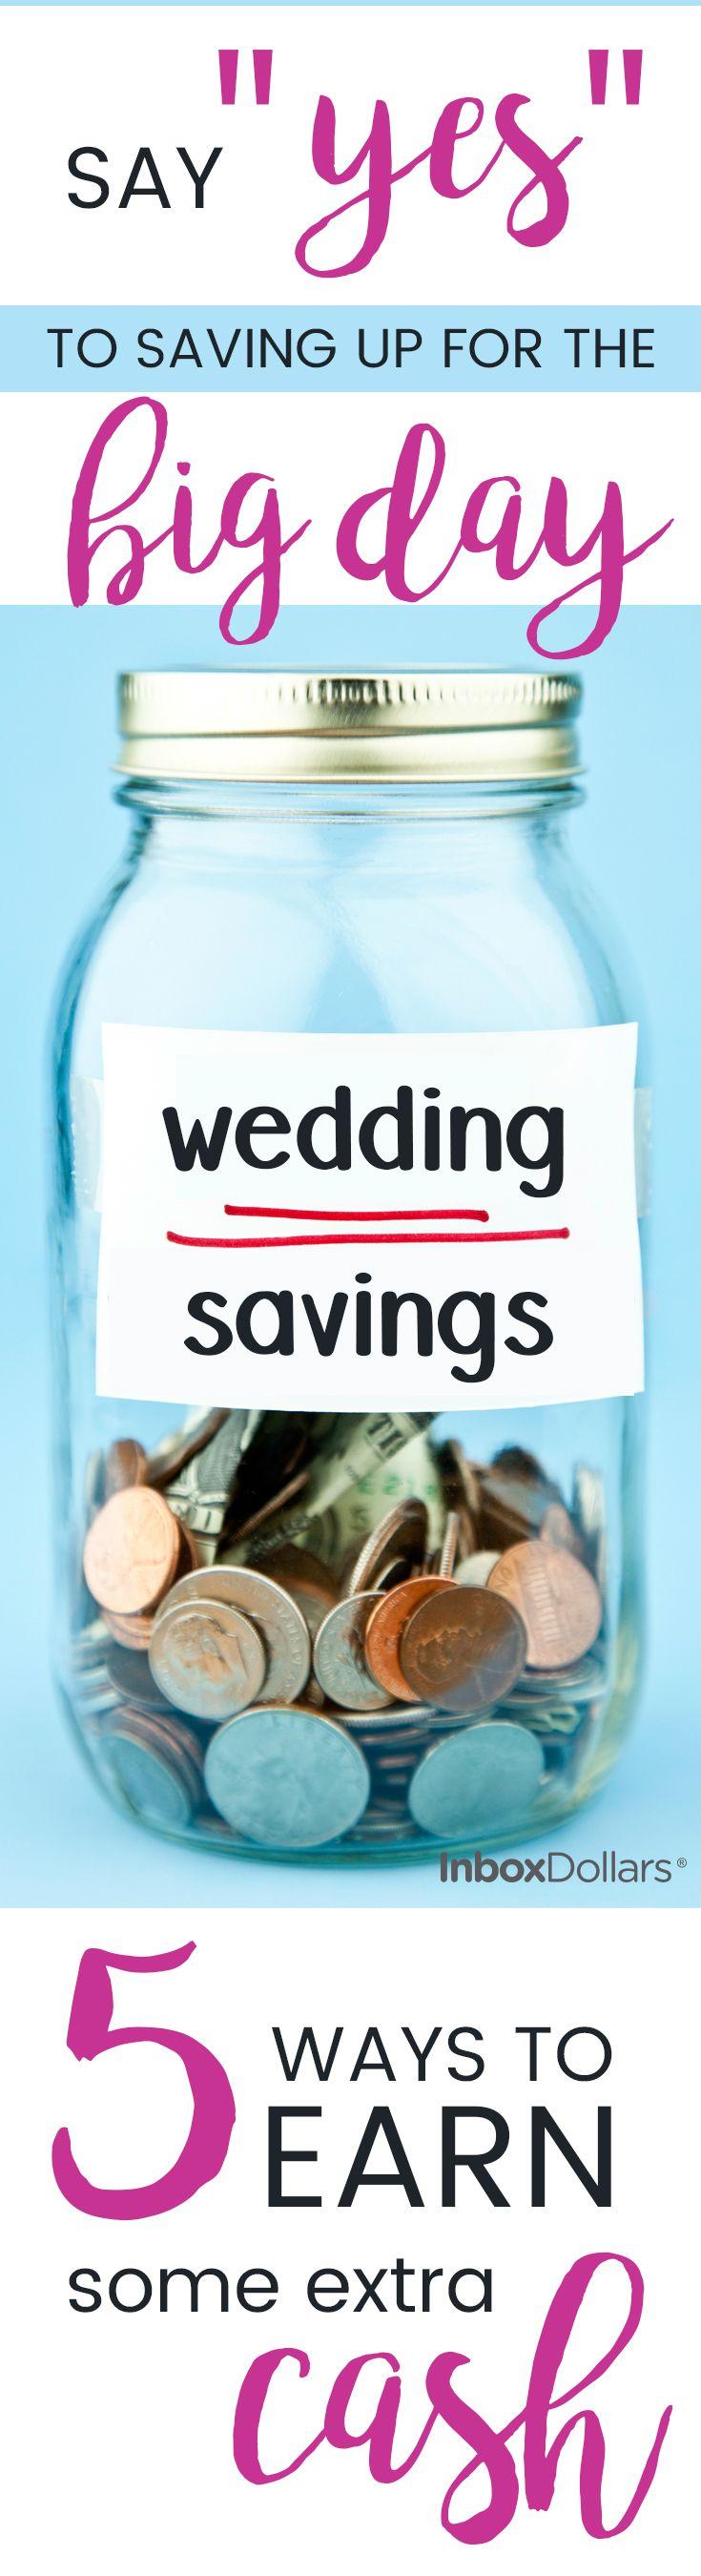 Inboxdollars Online Rewards Club  Earn Cash For Taking Surveys, Watching  Videos, Shopping Online